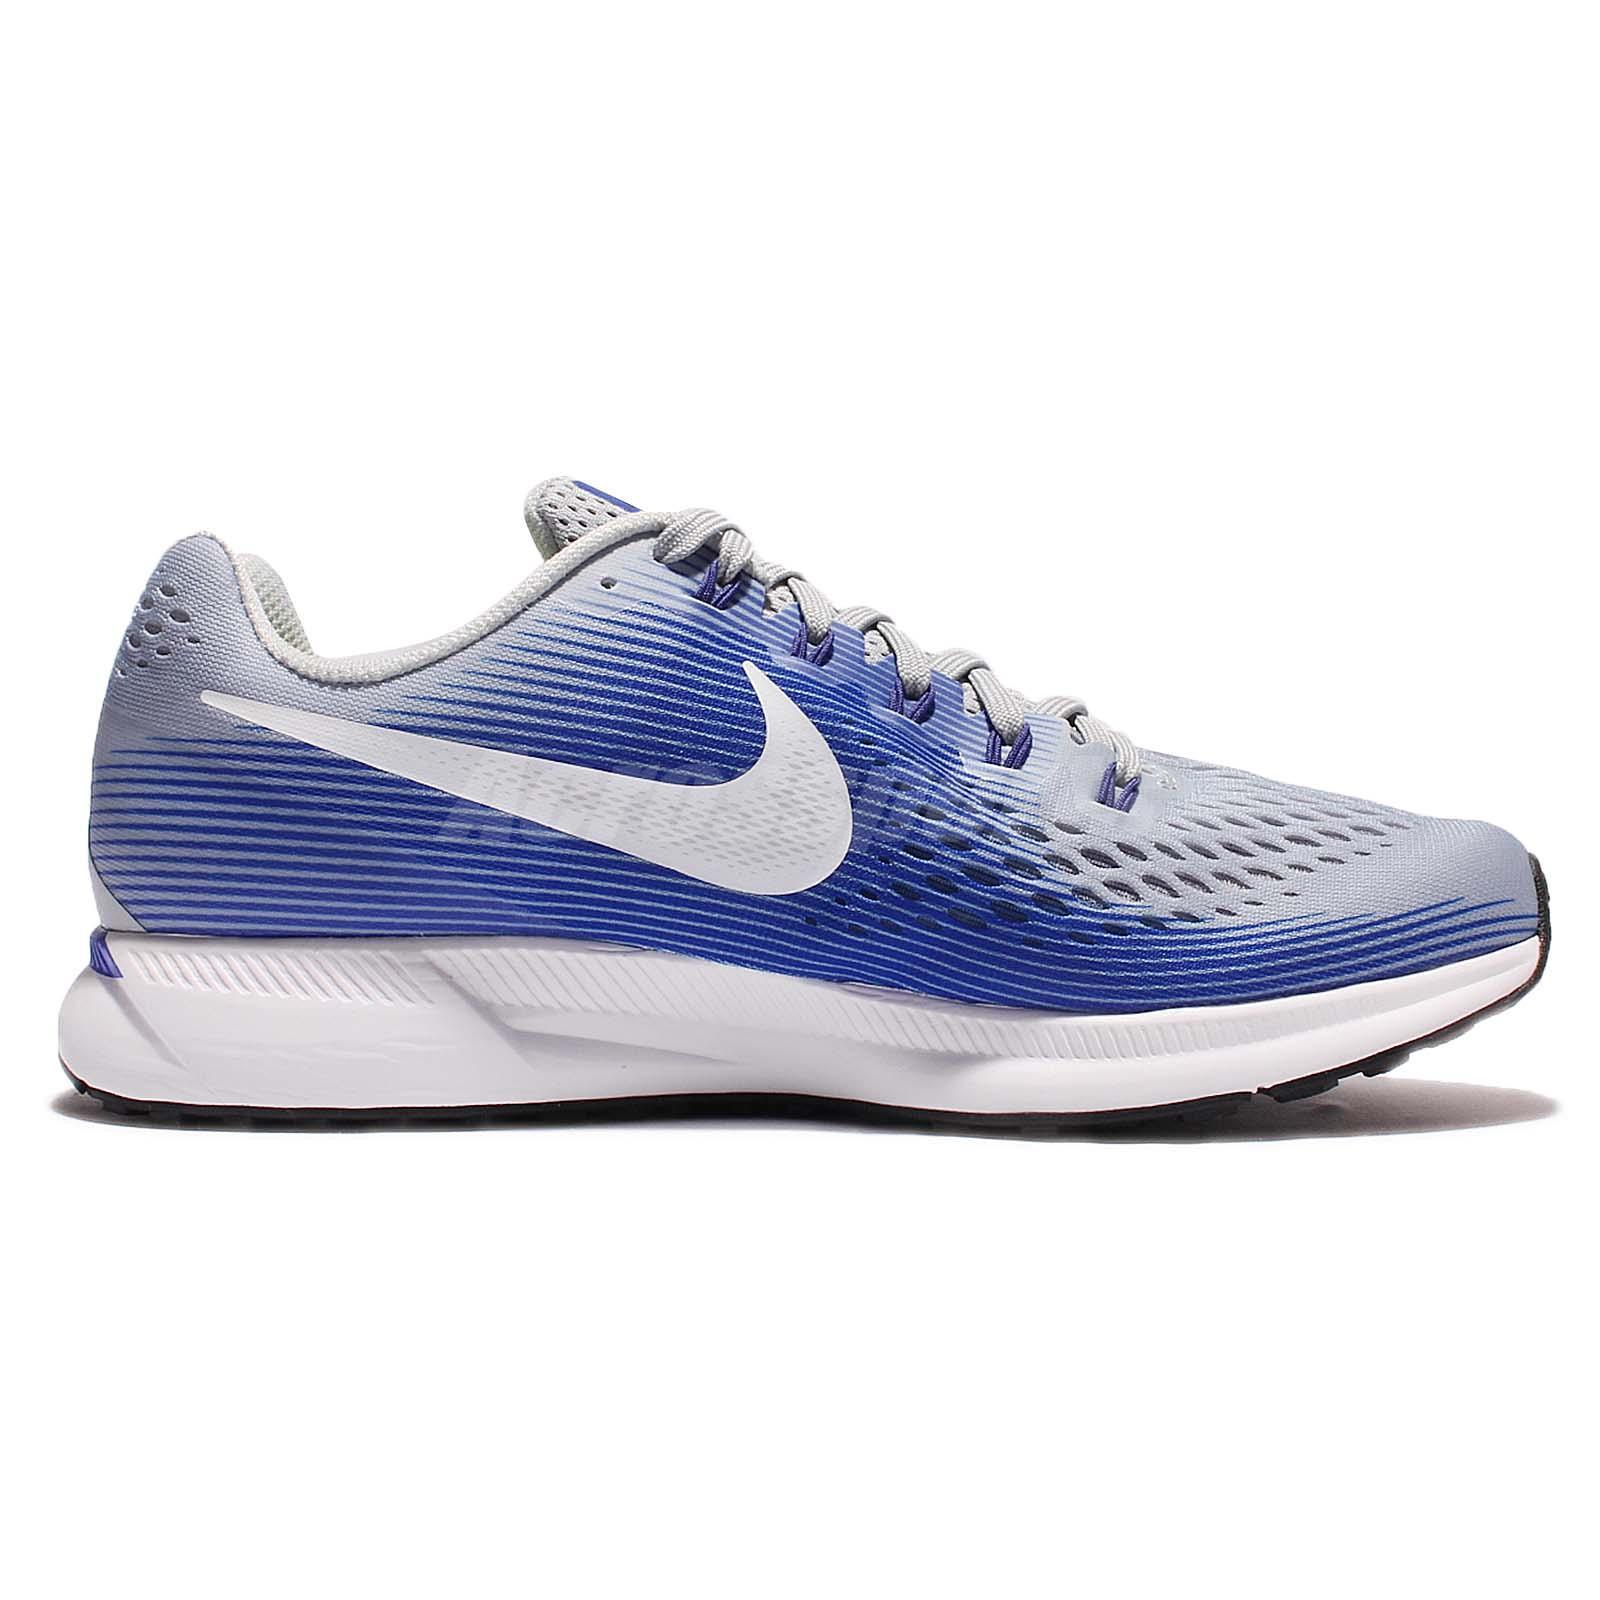 113b5e08b4cce Nike Air Zoom Pegasus 34 Racer Blue Grey Men Running Shoes Sneakers ...